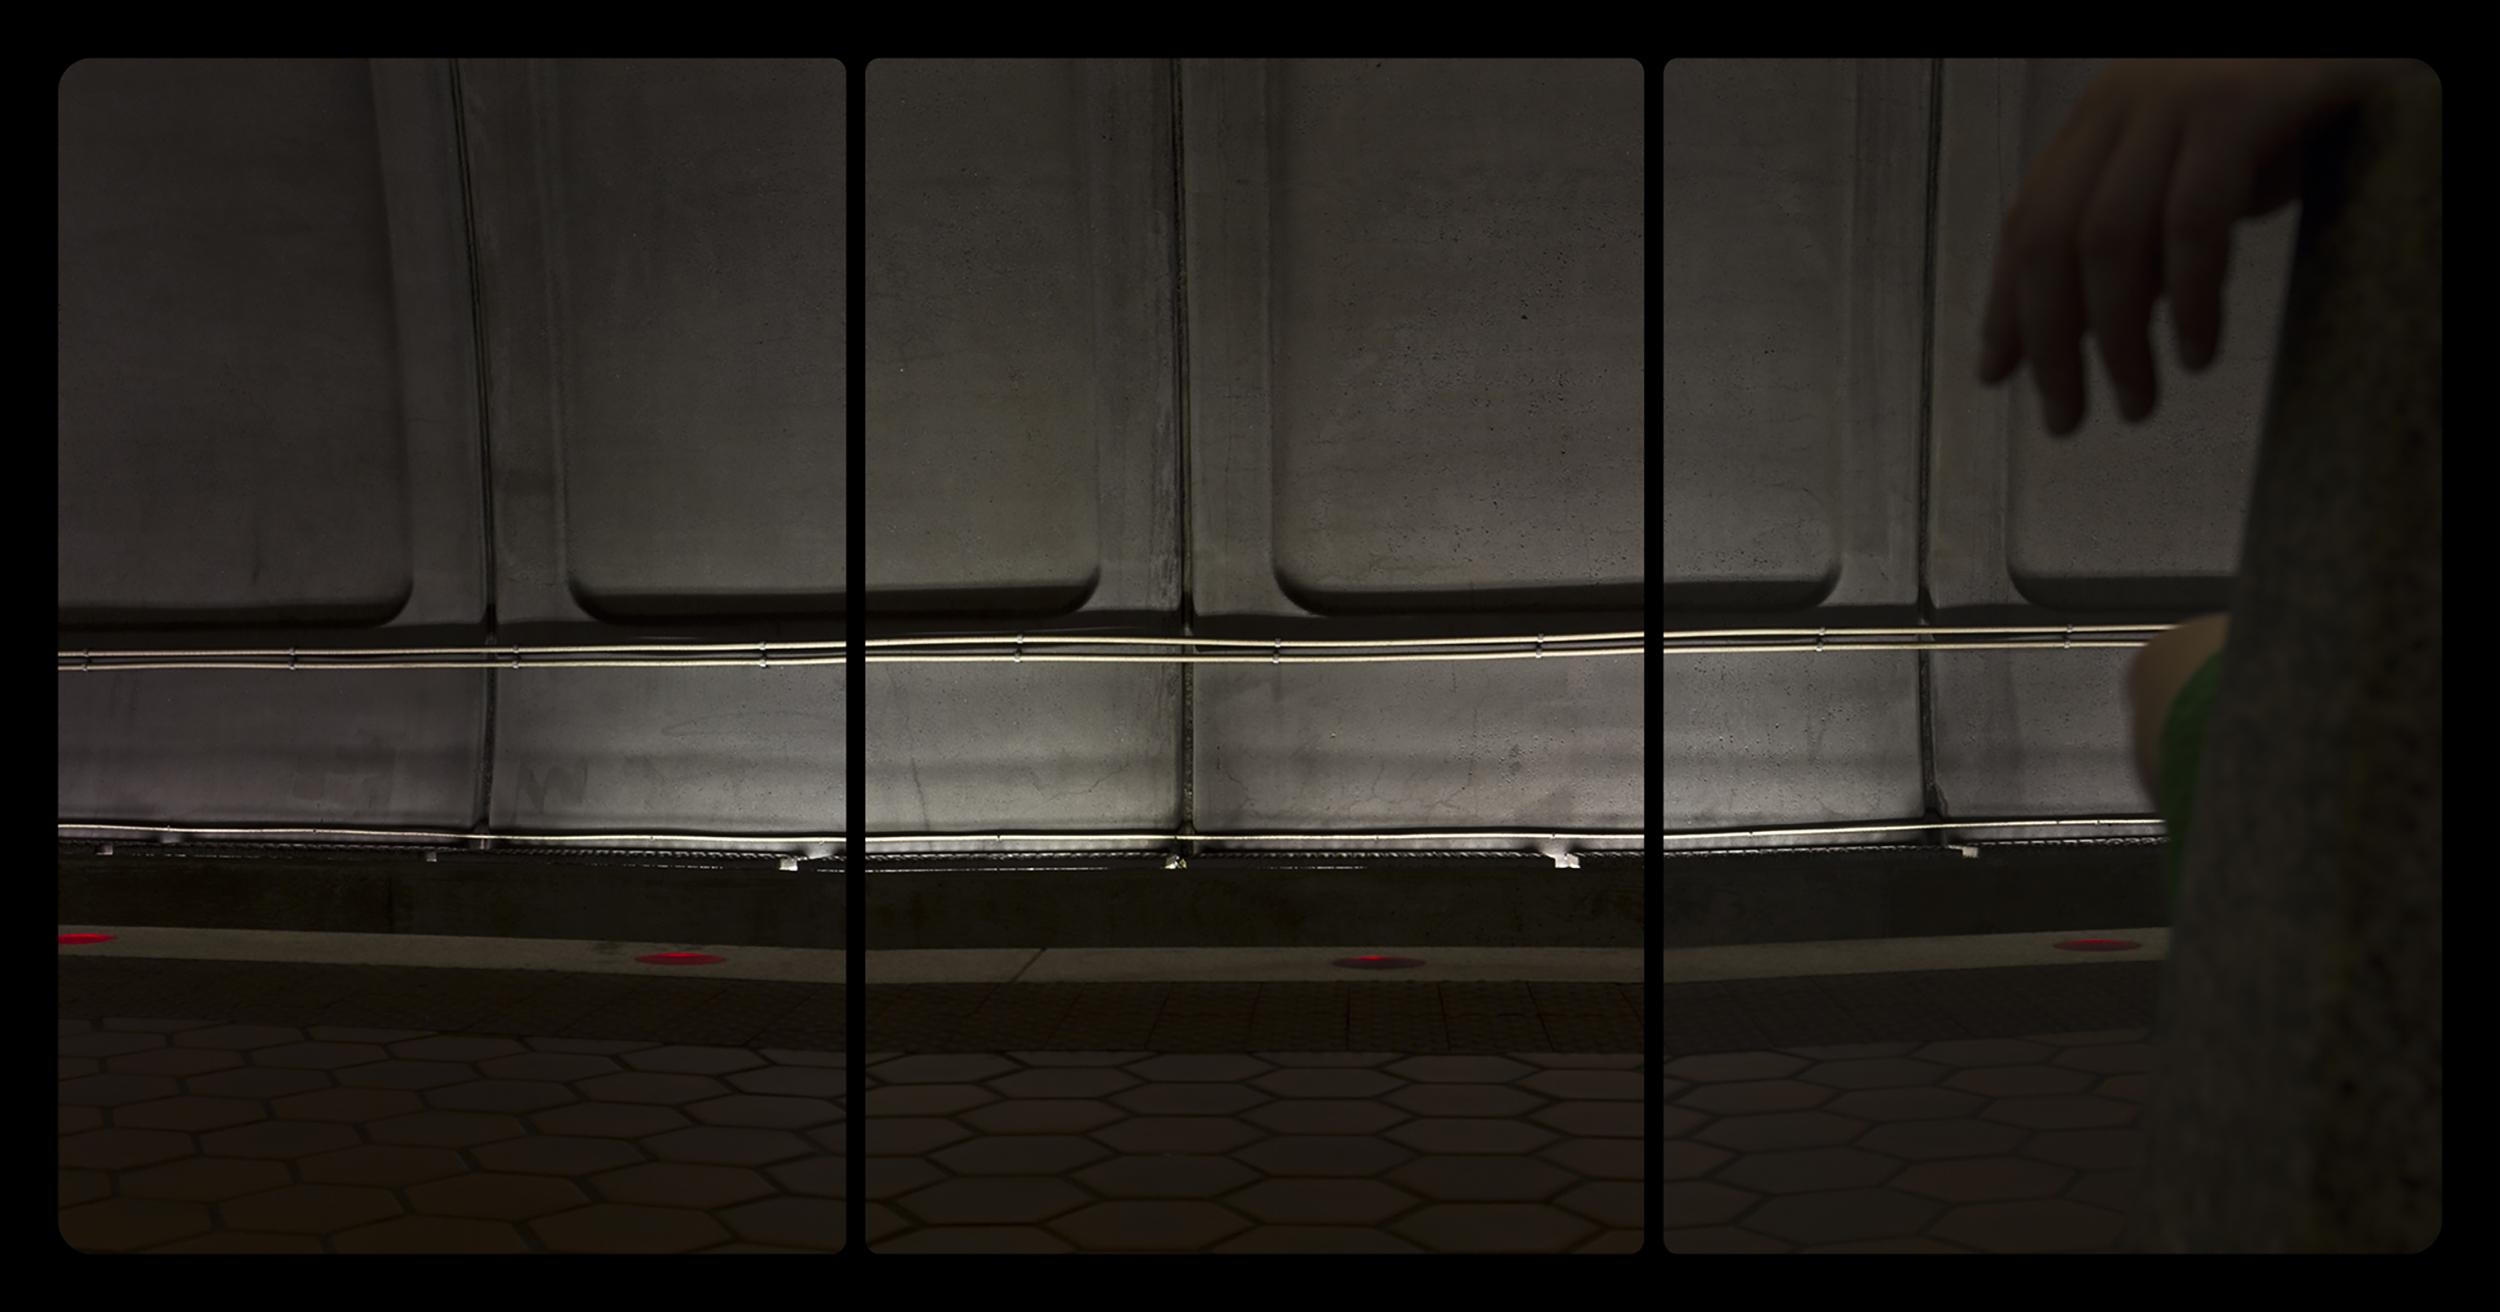 Metro Rail, Woodley Park-Zoo,6-15-2014-2761-2763